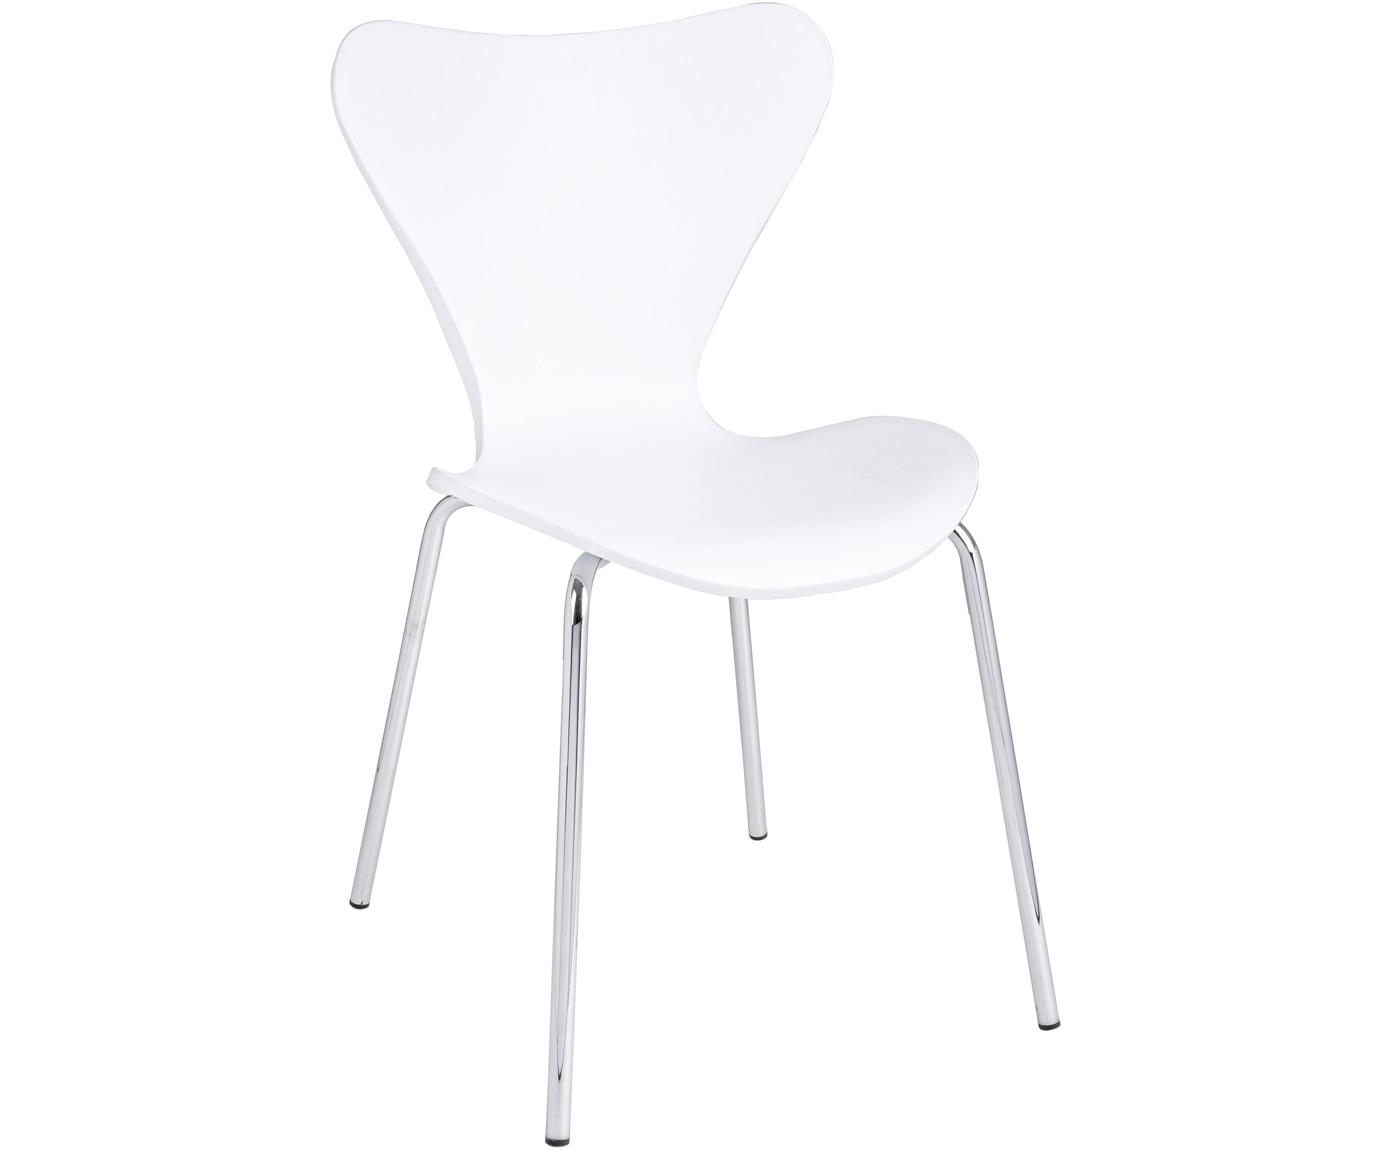 Sedia impilabile in plastica Tessa 2 pz, Seduta: materiale sintetico (poli, Gambe: metallo cromato, Bianco, cromo, Larg. 50 x Prof. 50 cm